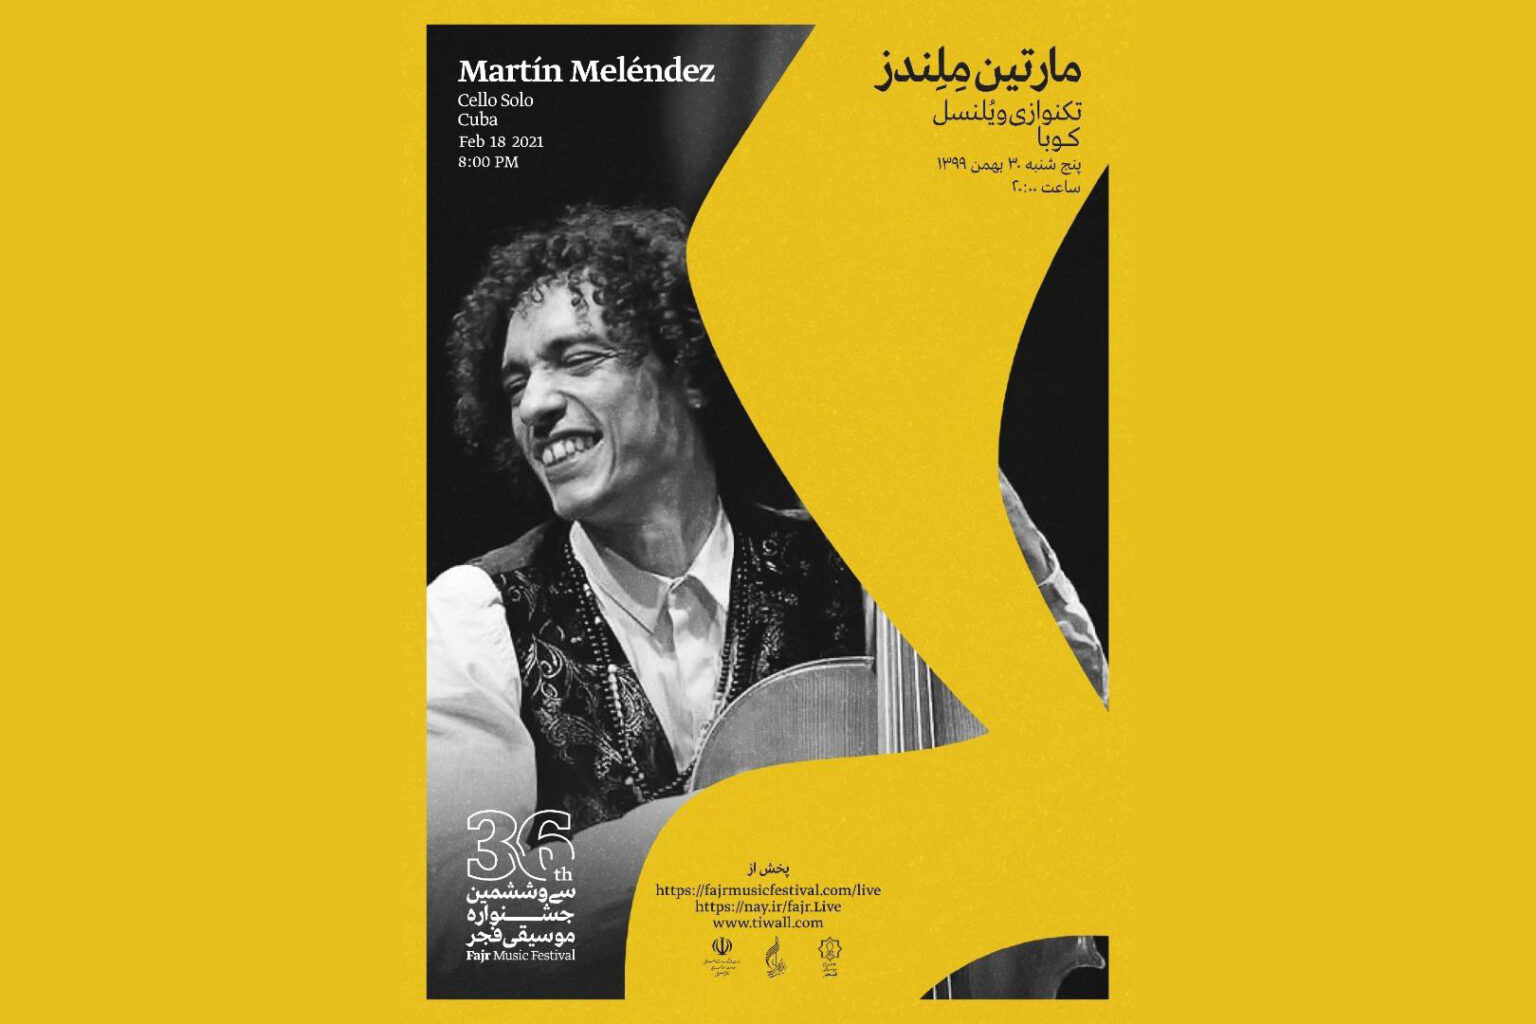 مارتین-ملندز-1536x1024